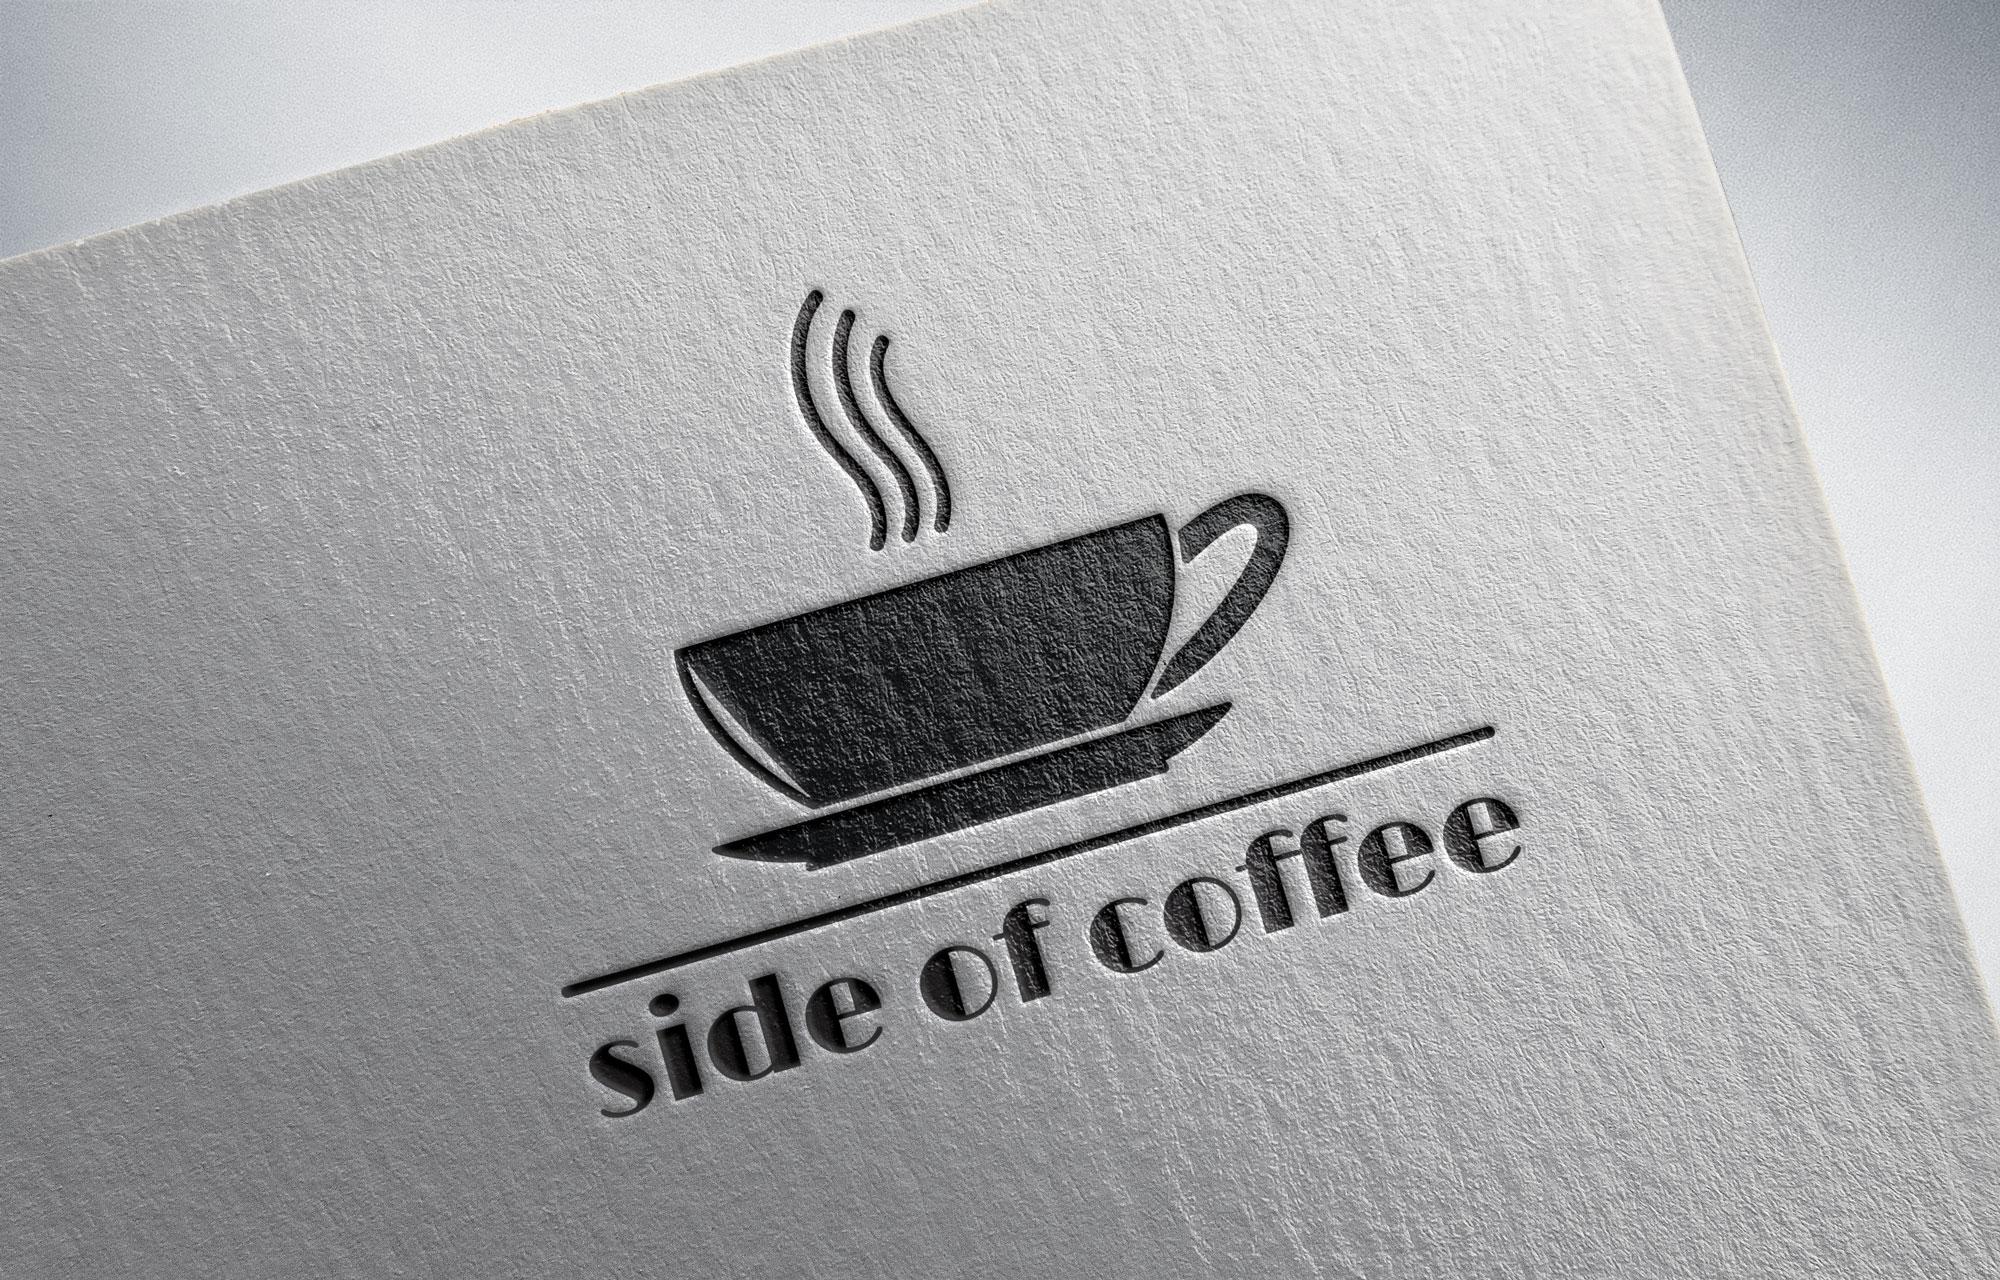 identity system, logo mark coffee business card design by megan alissa